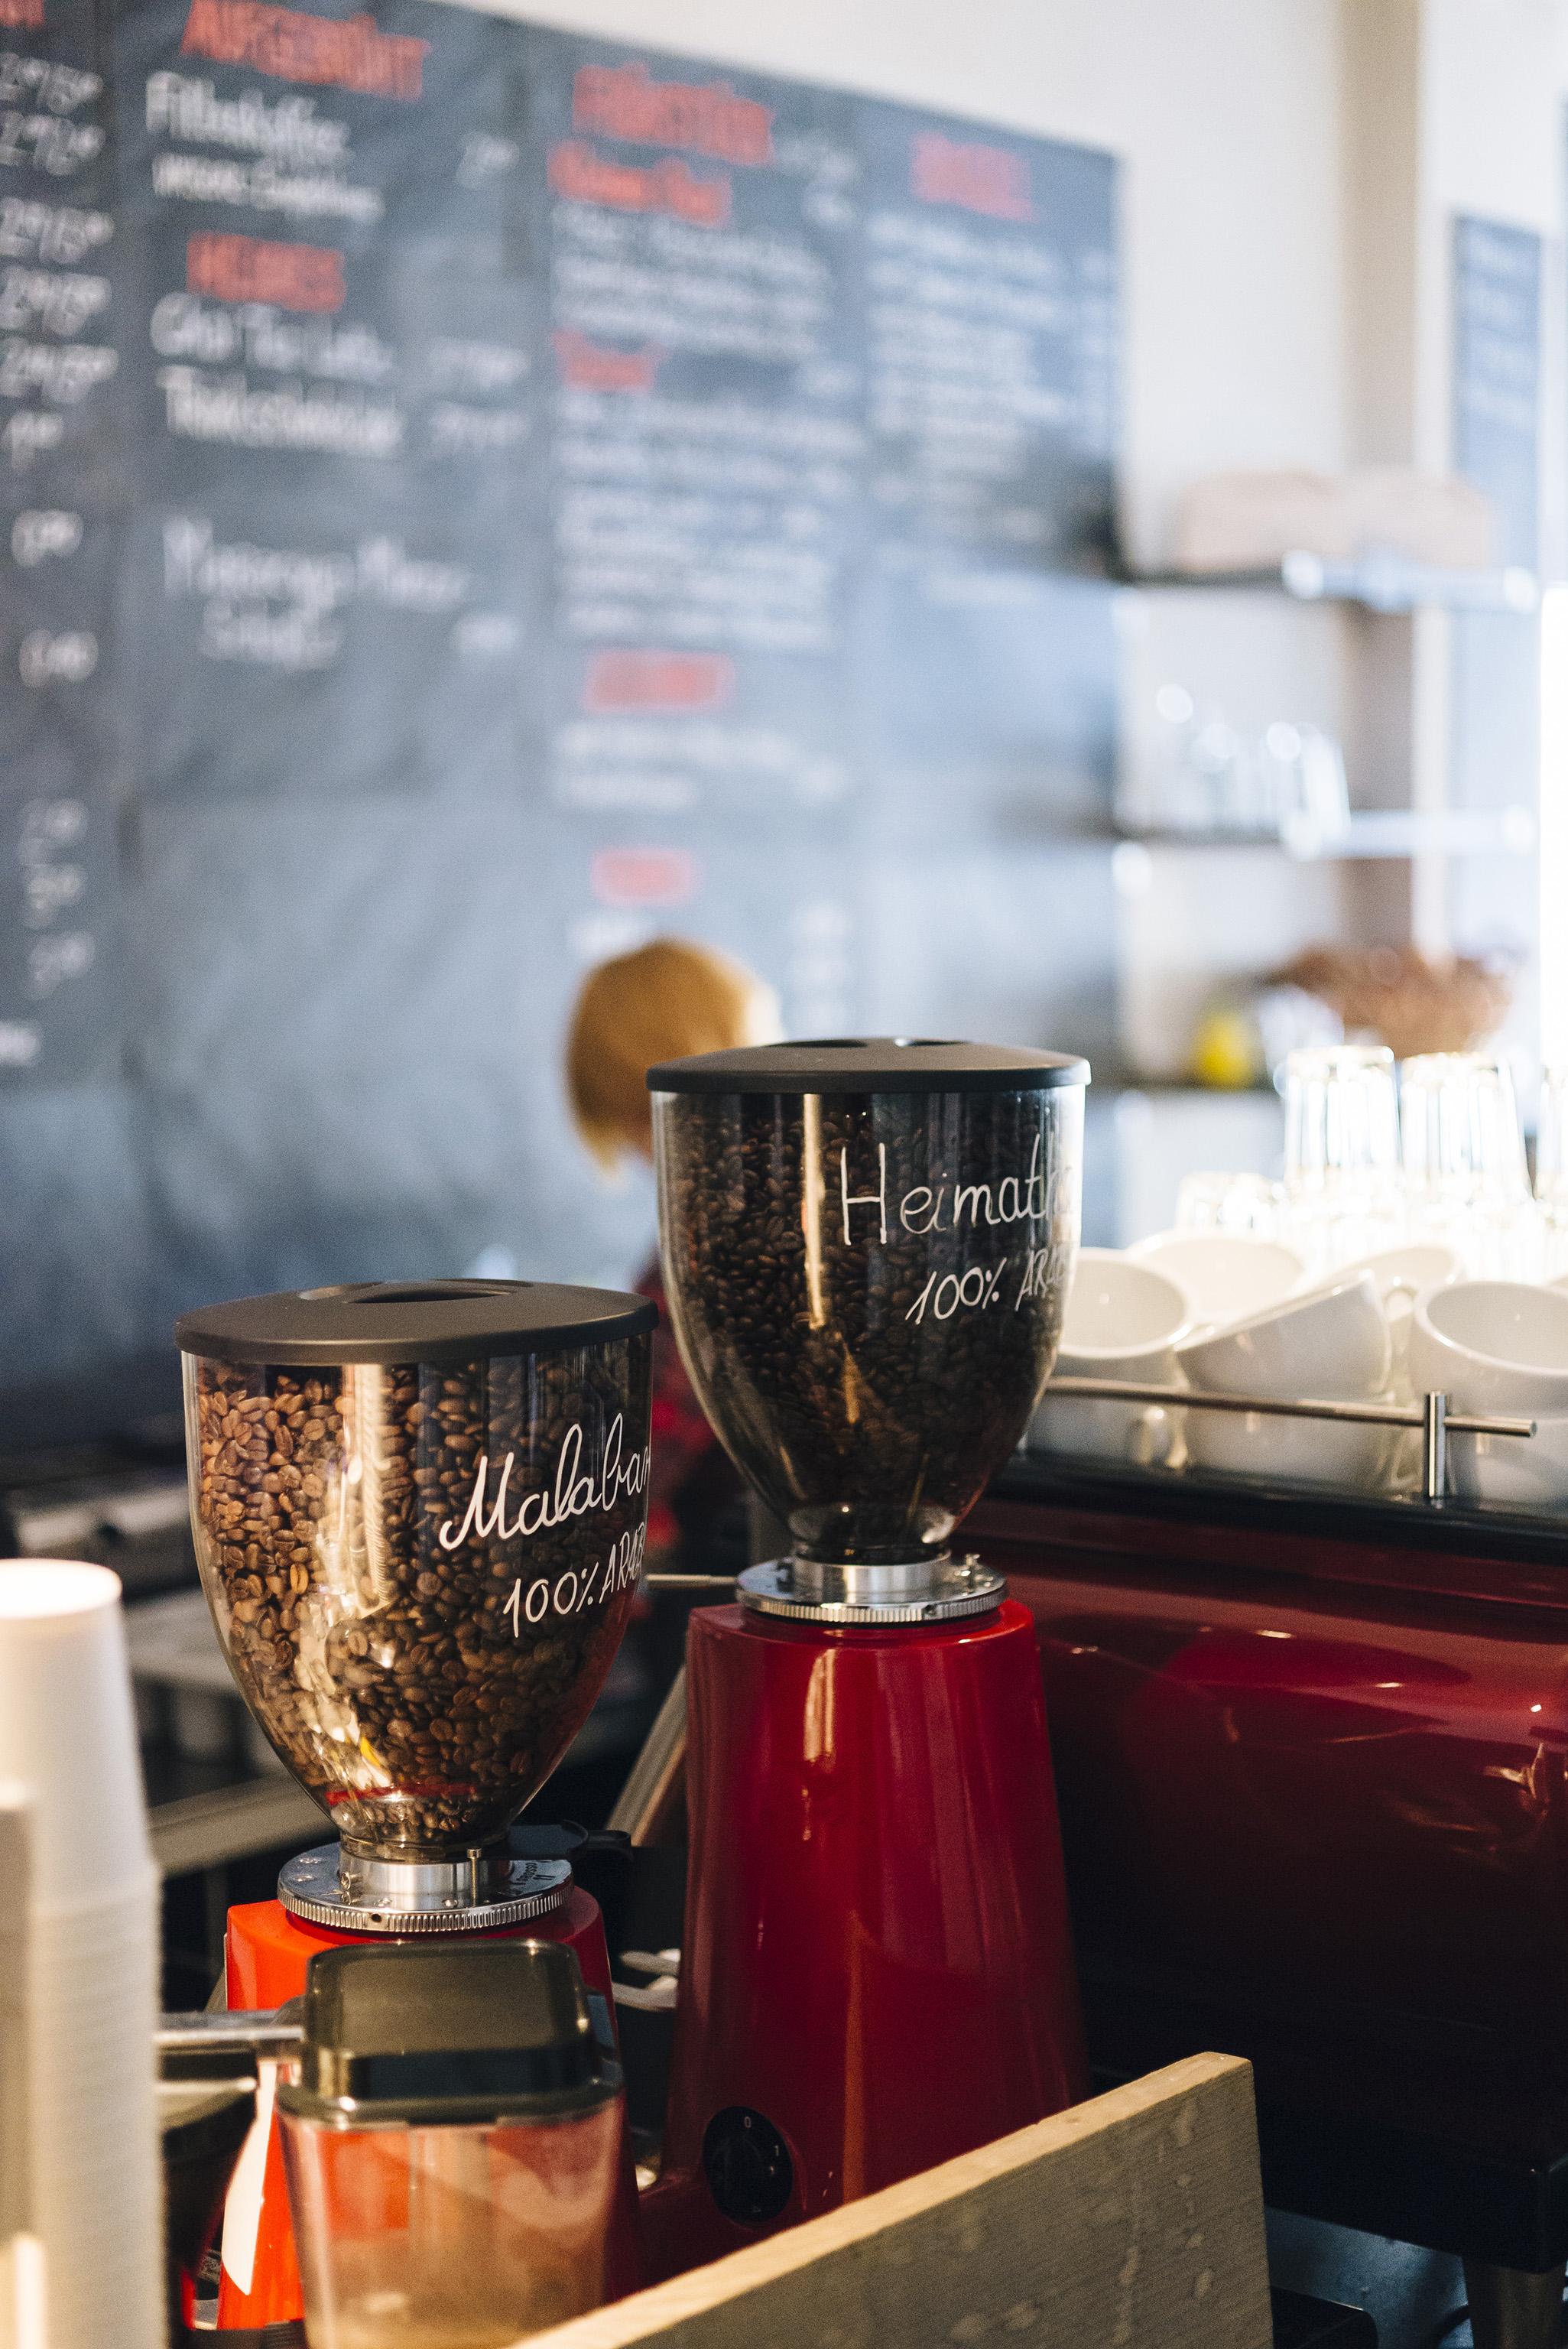 sweet-coffee-pirates-rüttenscheid-essen-pottspott-19.jpg